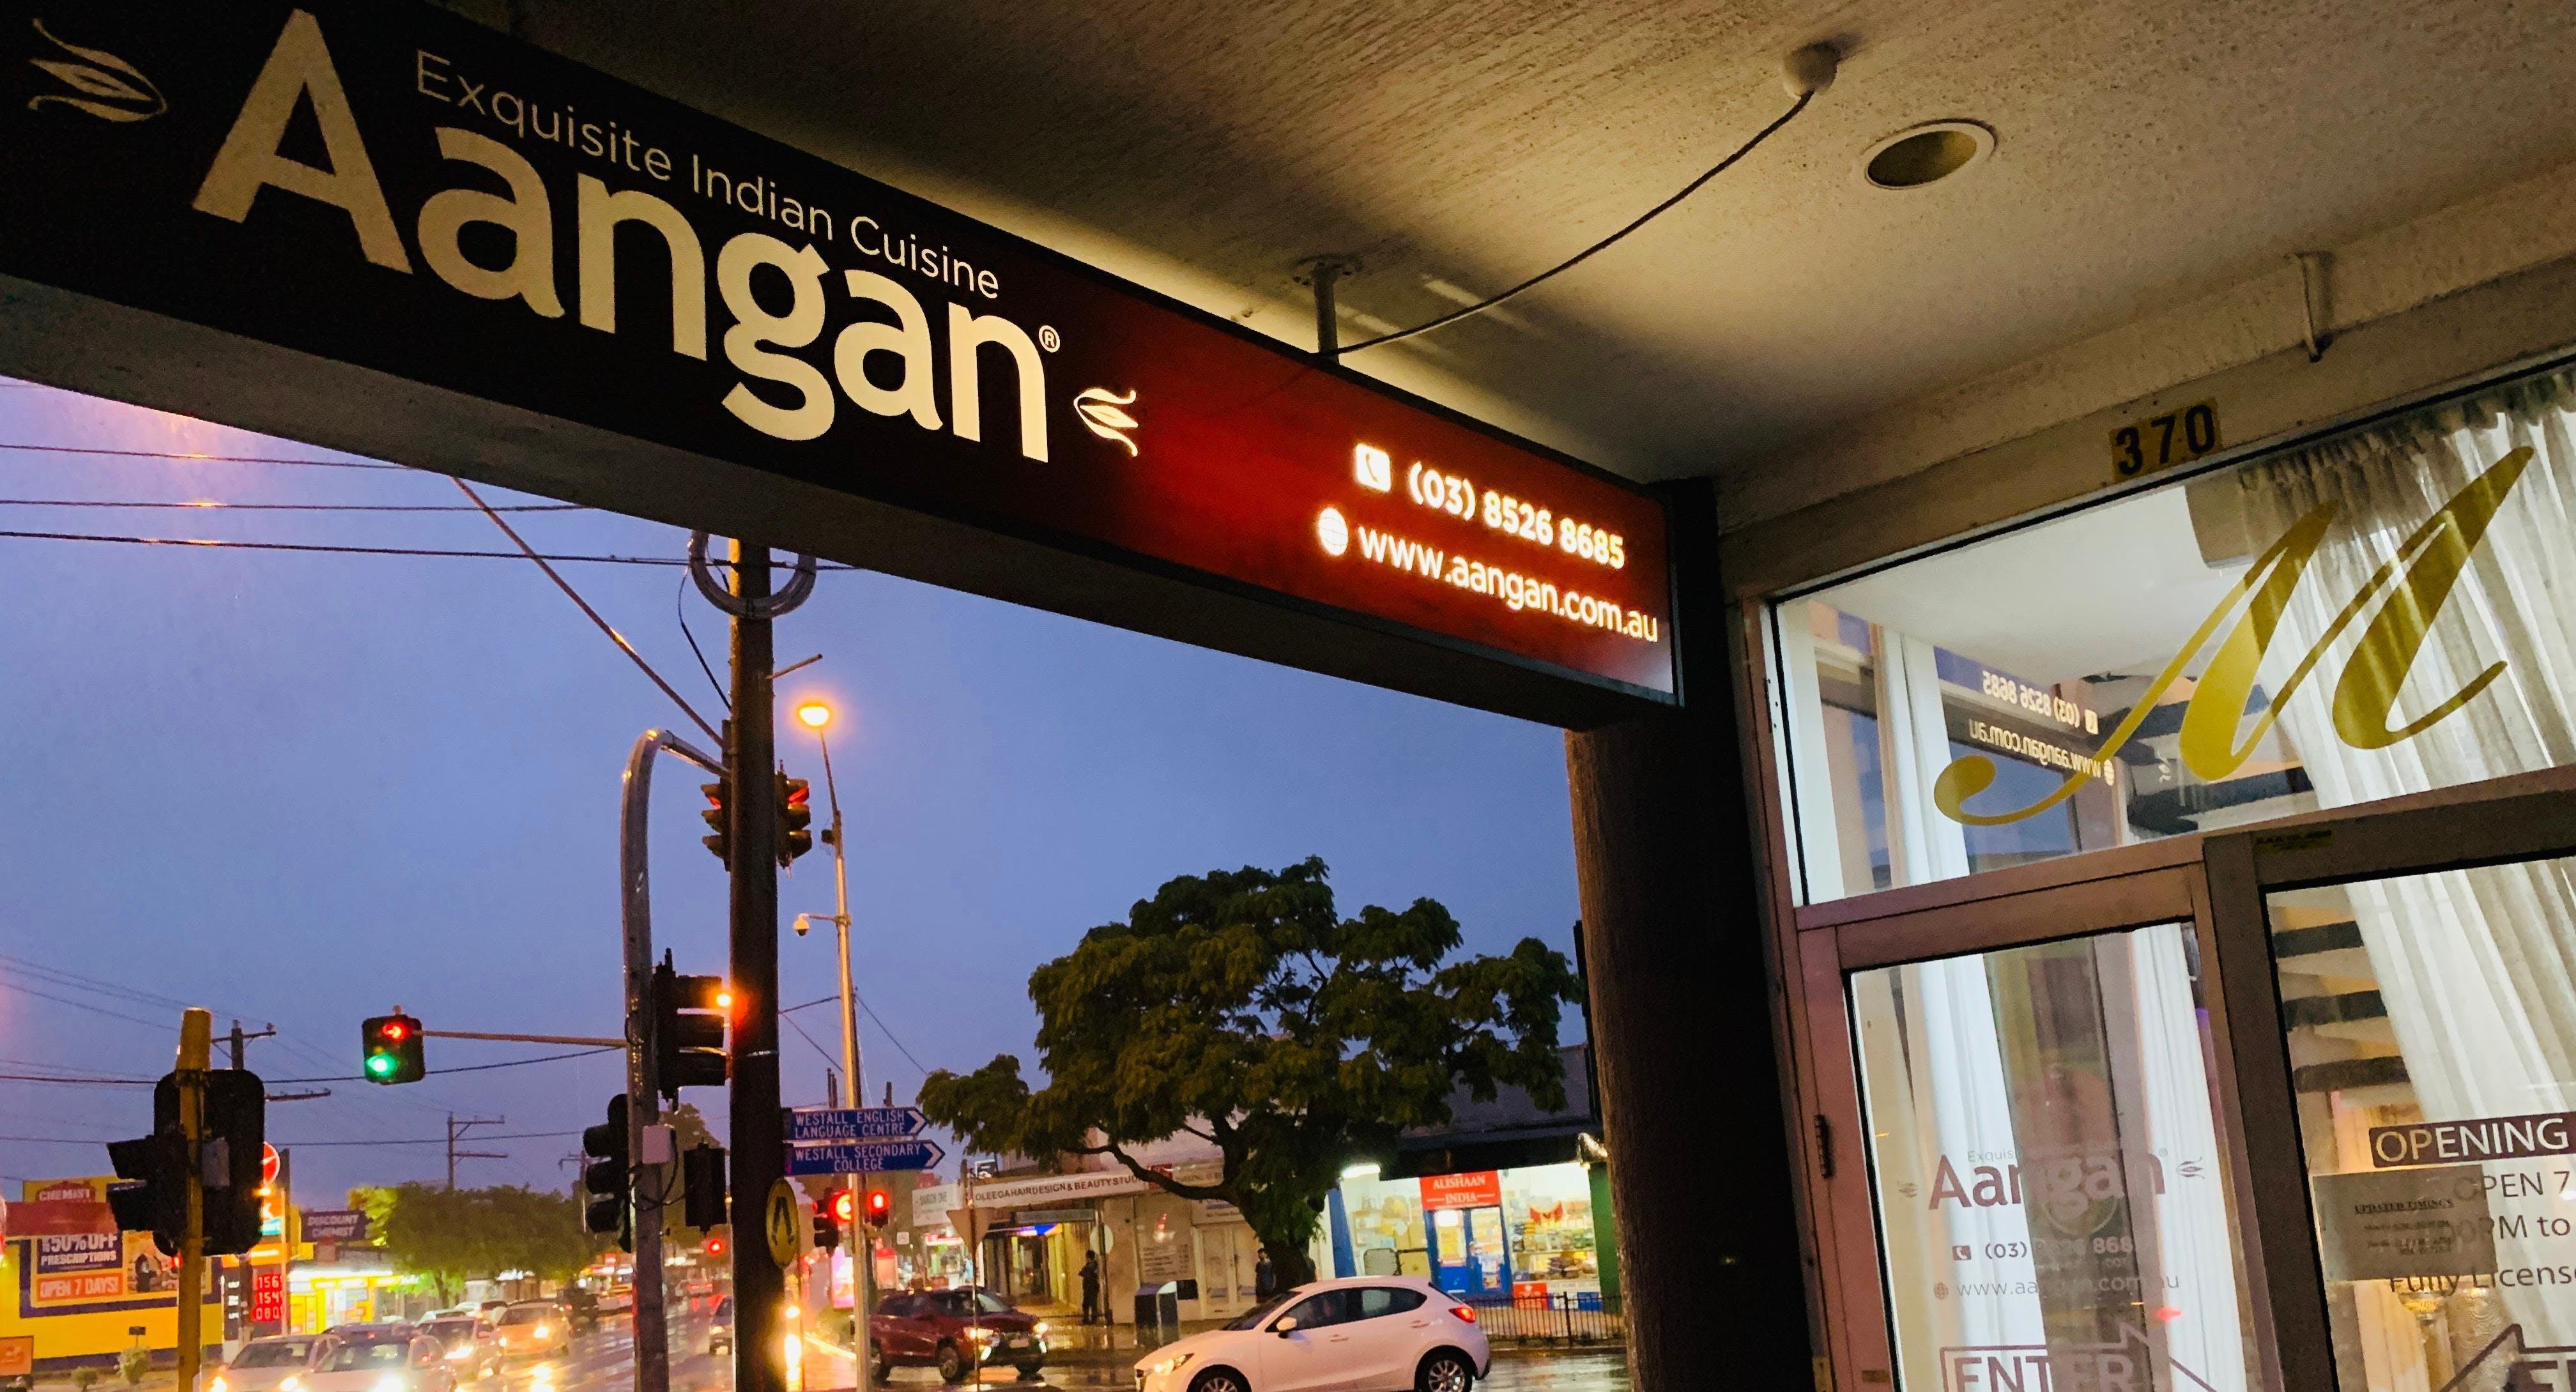 Photo of restaurant Aangan Indian Restaurant Clayton in Clayton, Melbourne